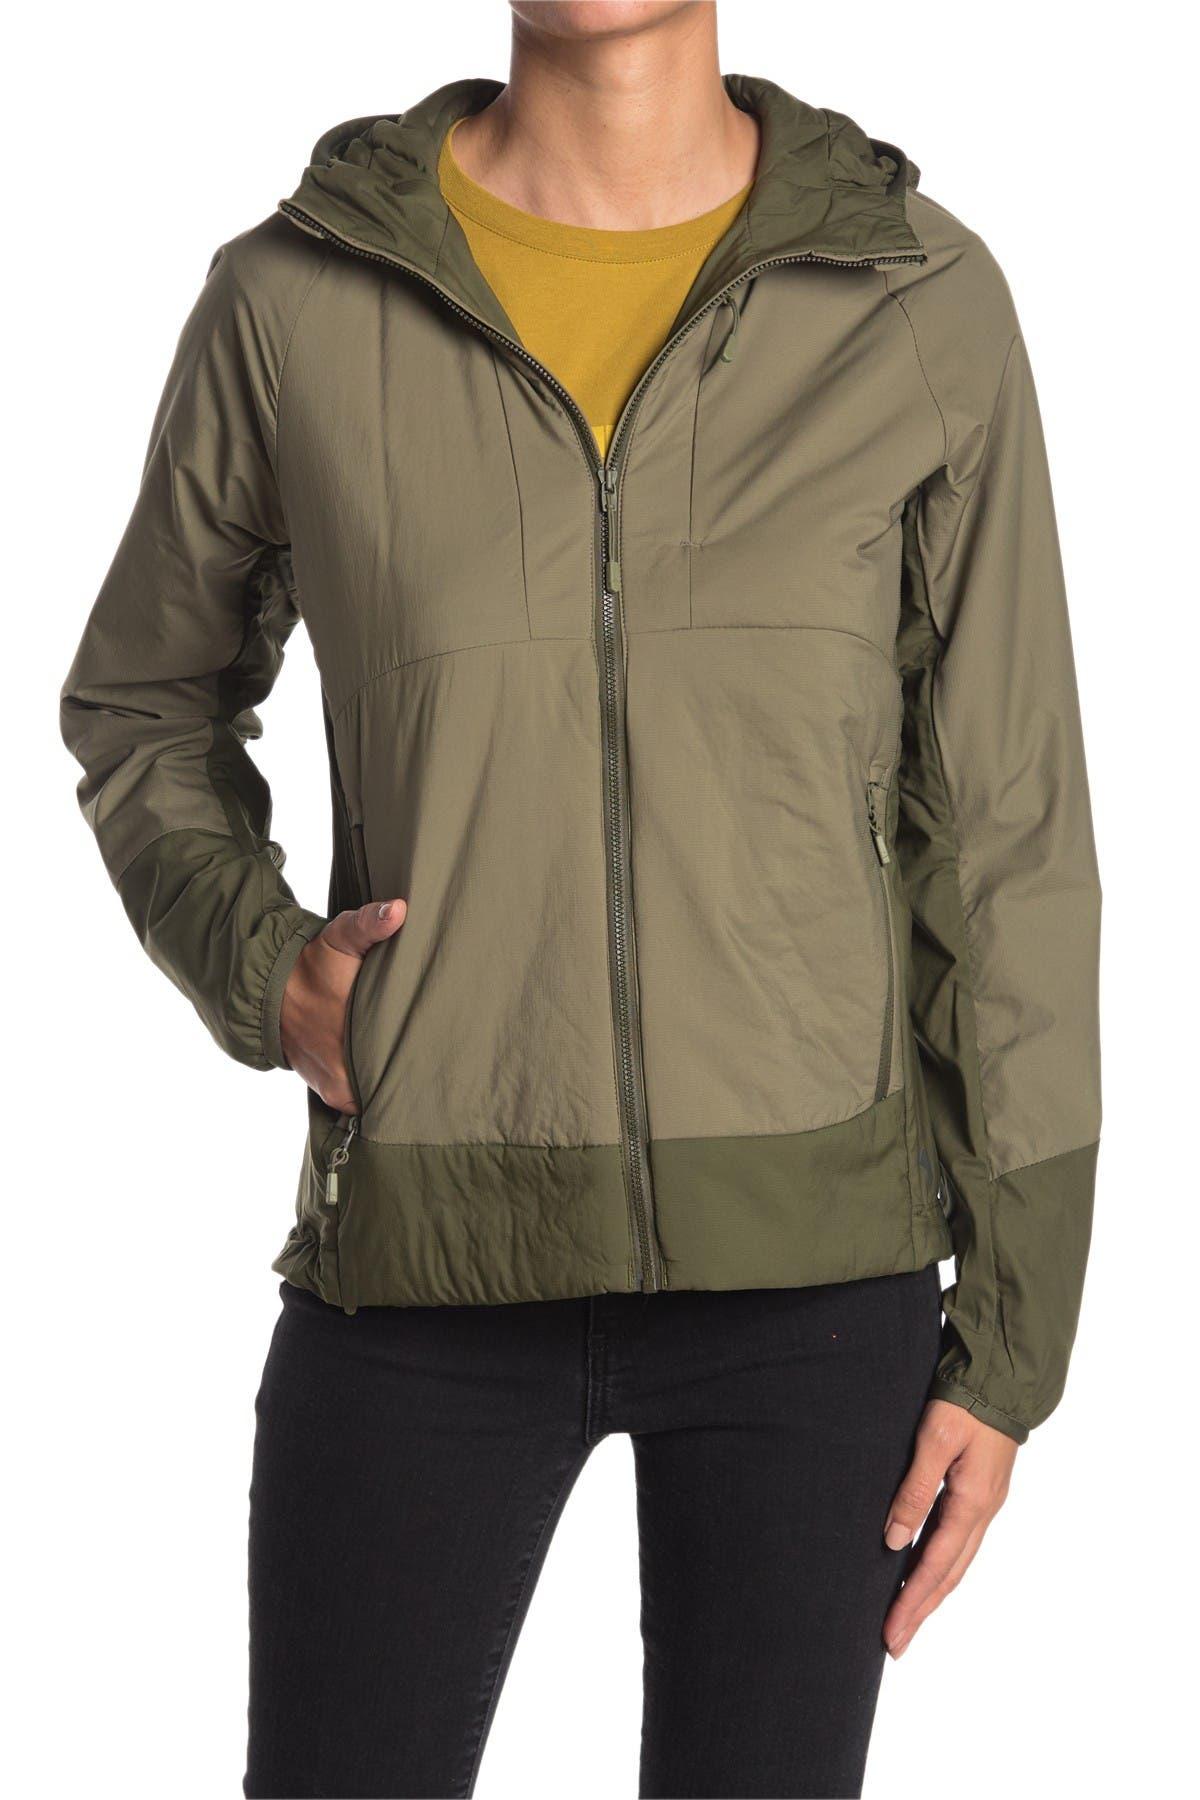 Image of MOUNTAIN HARDWEAR Kor Cirrus Hybrid Insulated Hooded Jacket